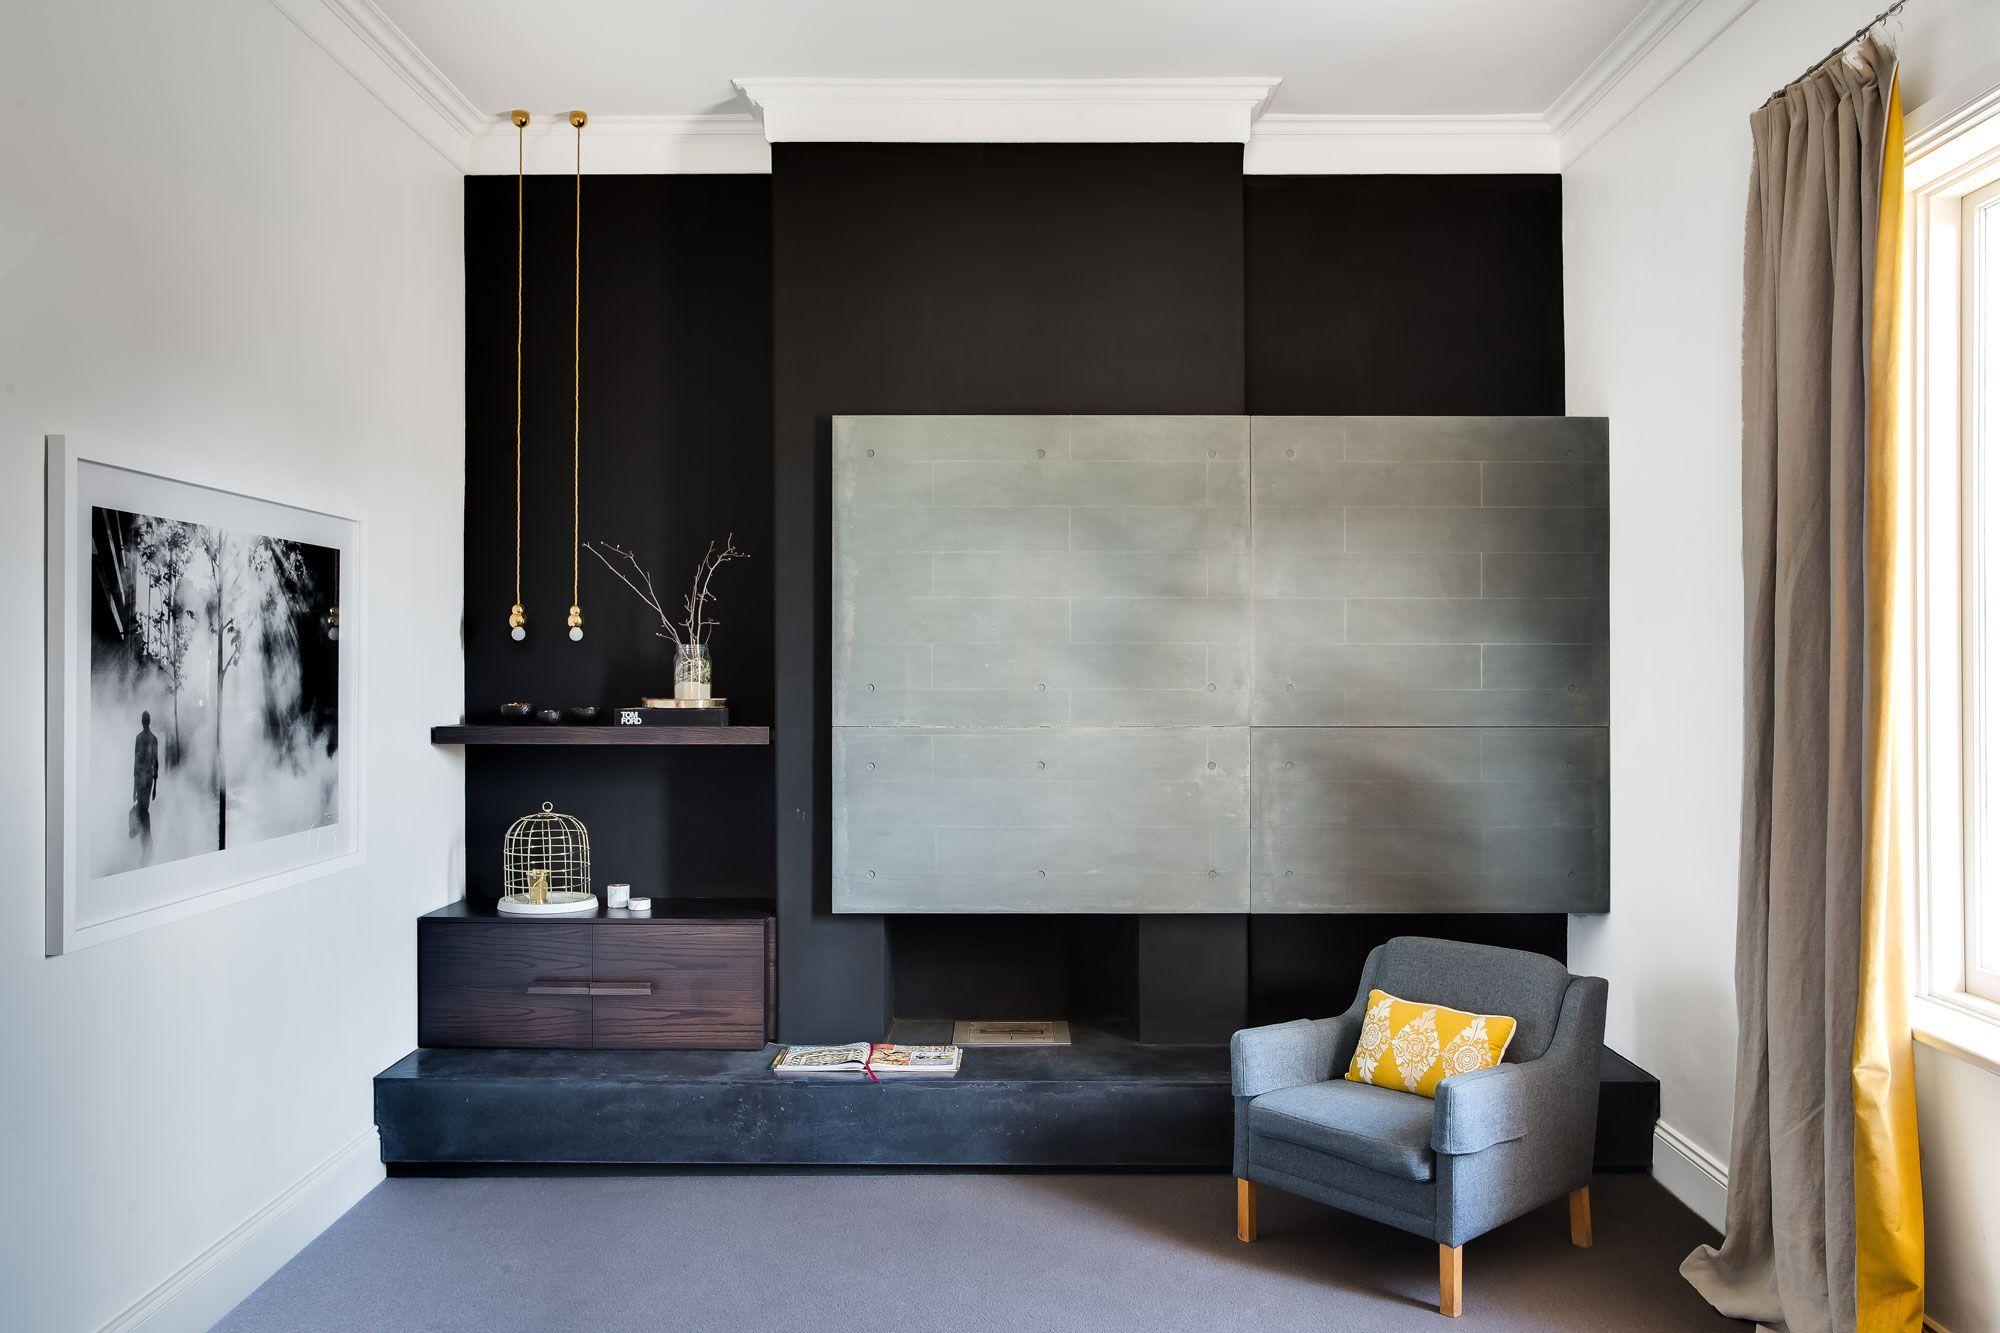 Bestes hausfrontdesign world best interior designer featuring designbywbl for more